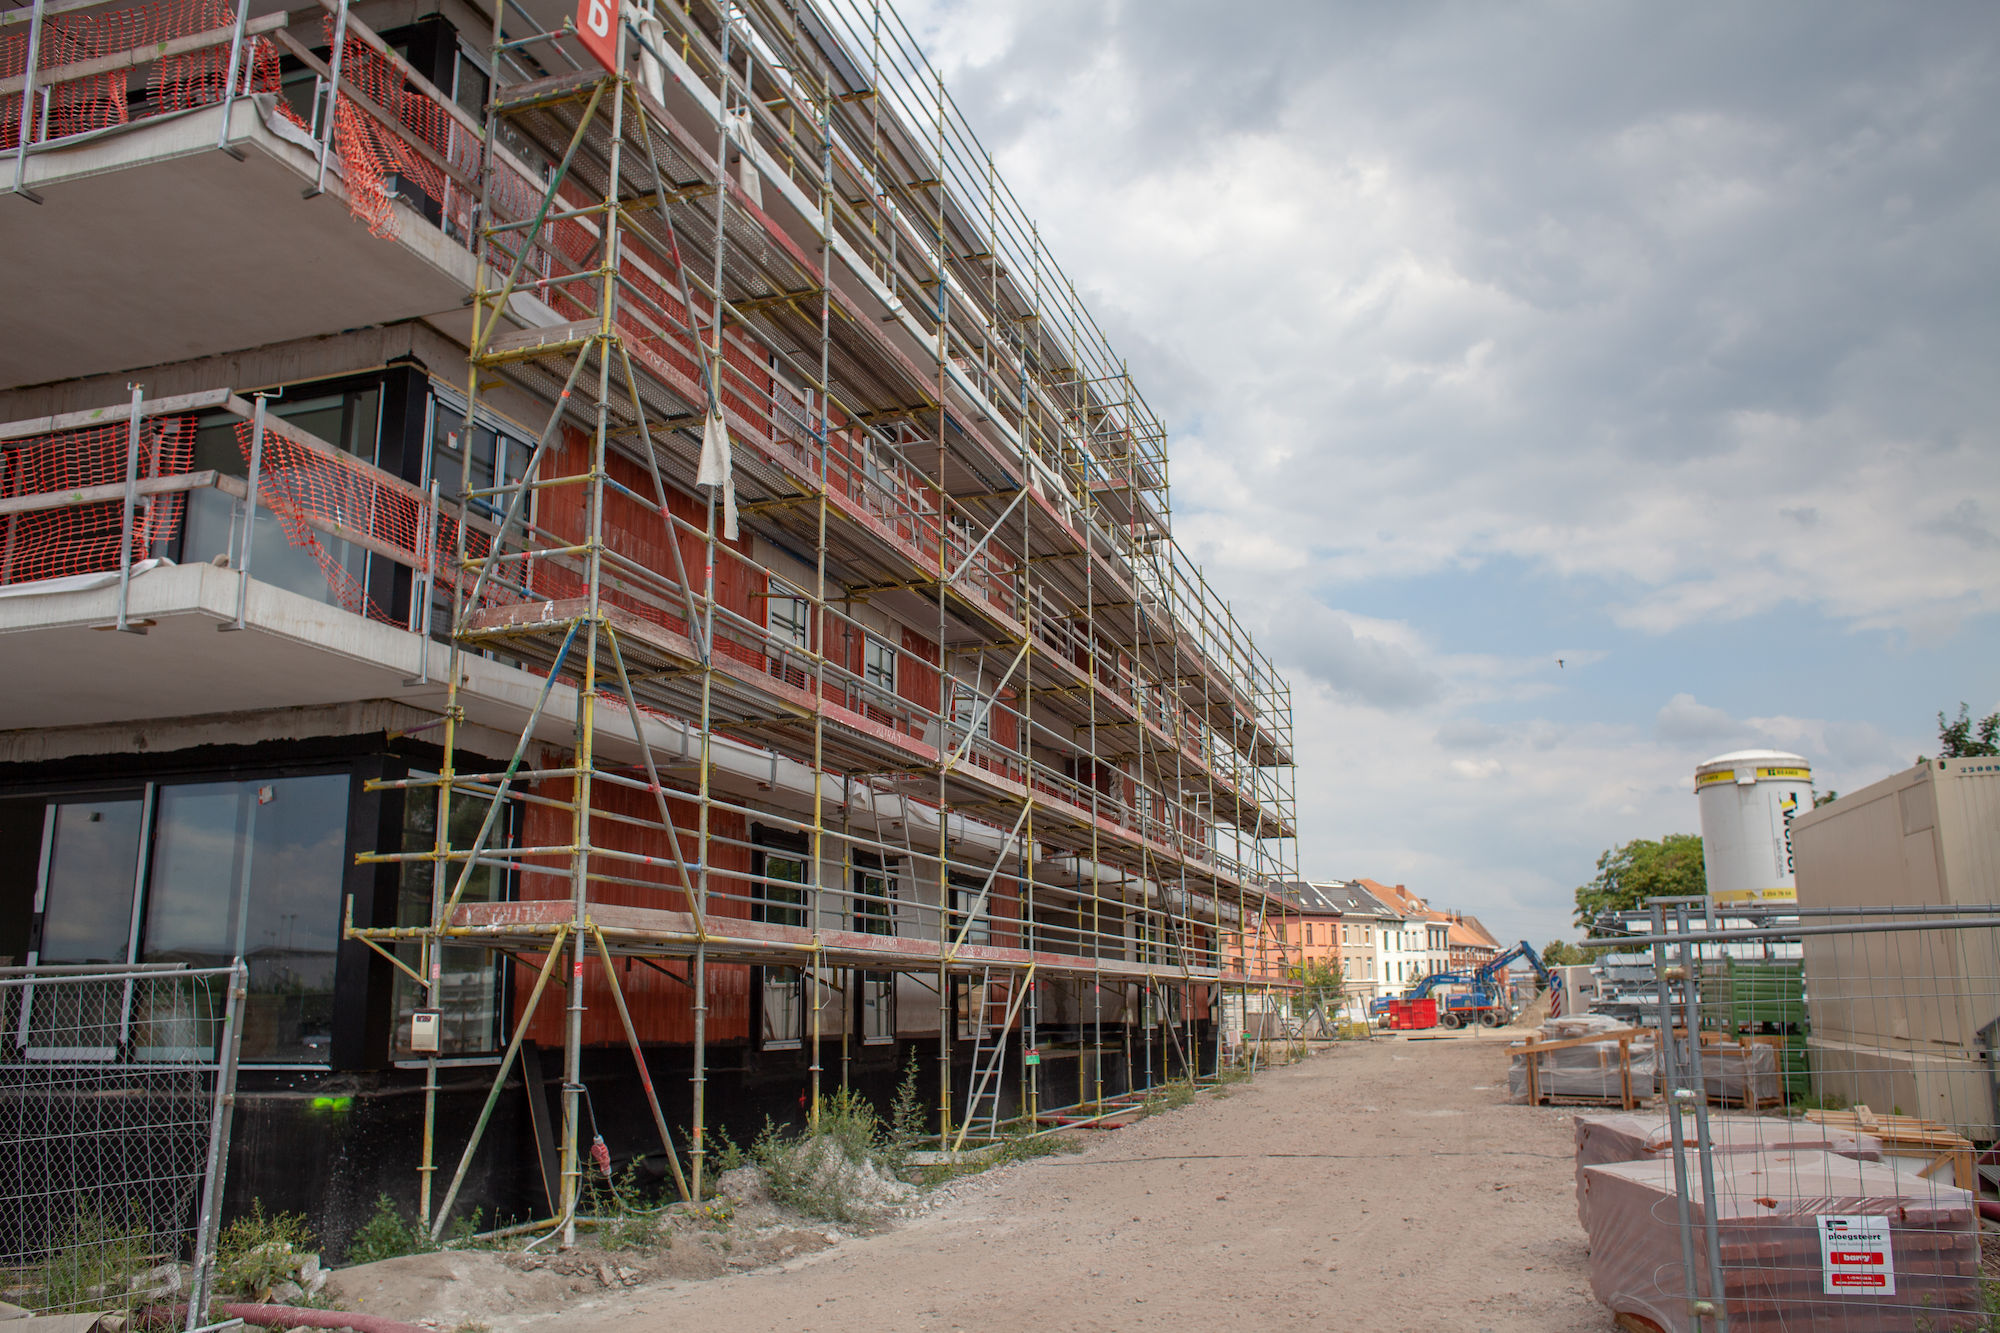 2019-07-02 Muide Meulestede prospectie Wannes_stadsvernieuwing_IMG_0423-3.jpg